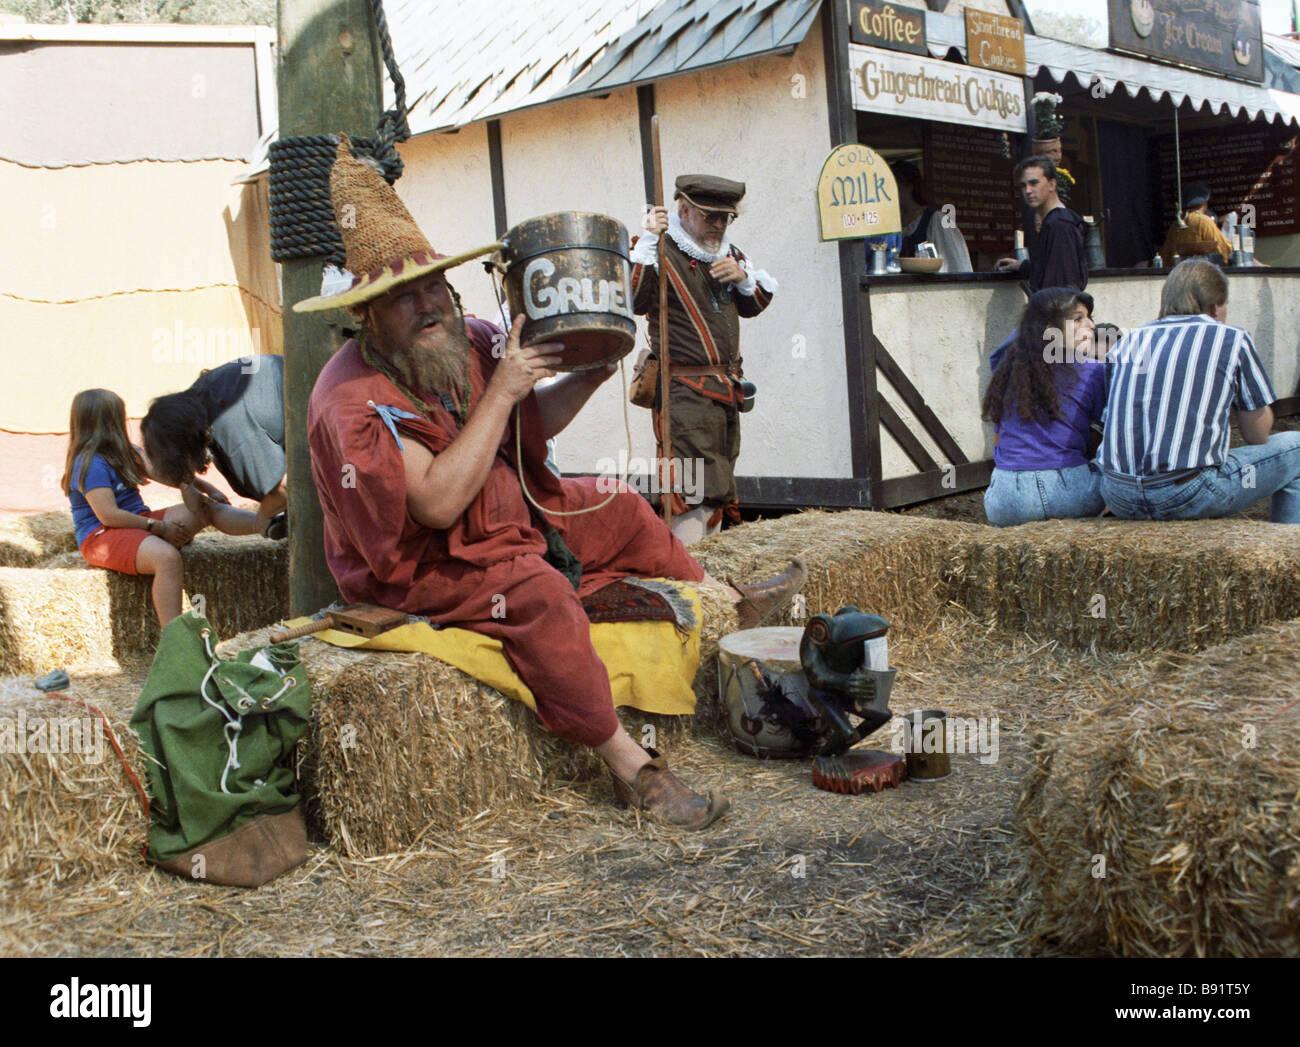 Skomorokh und Zauberer im Renaissance Genuss Fair San Francisco Stockbild